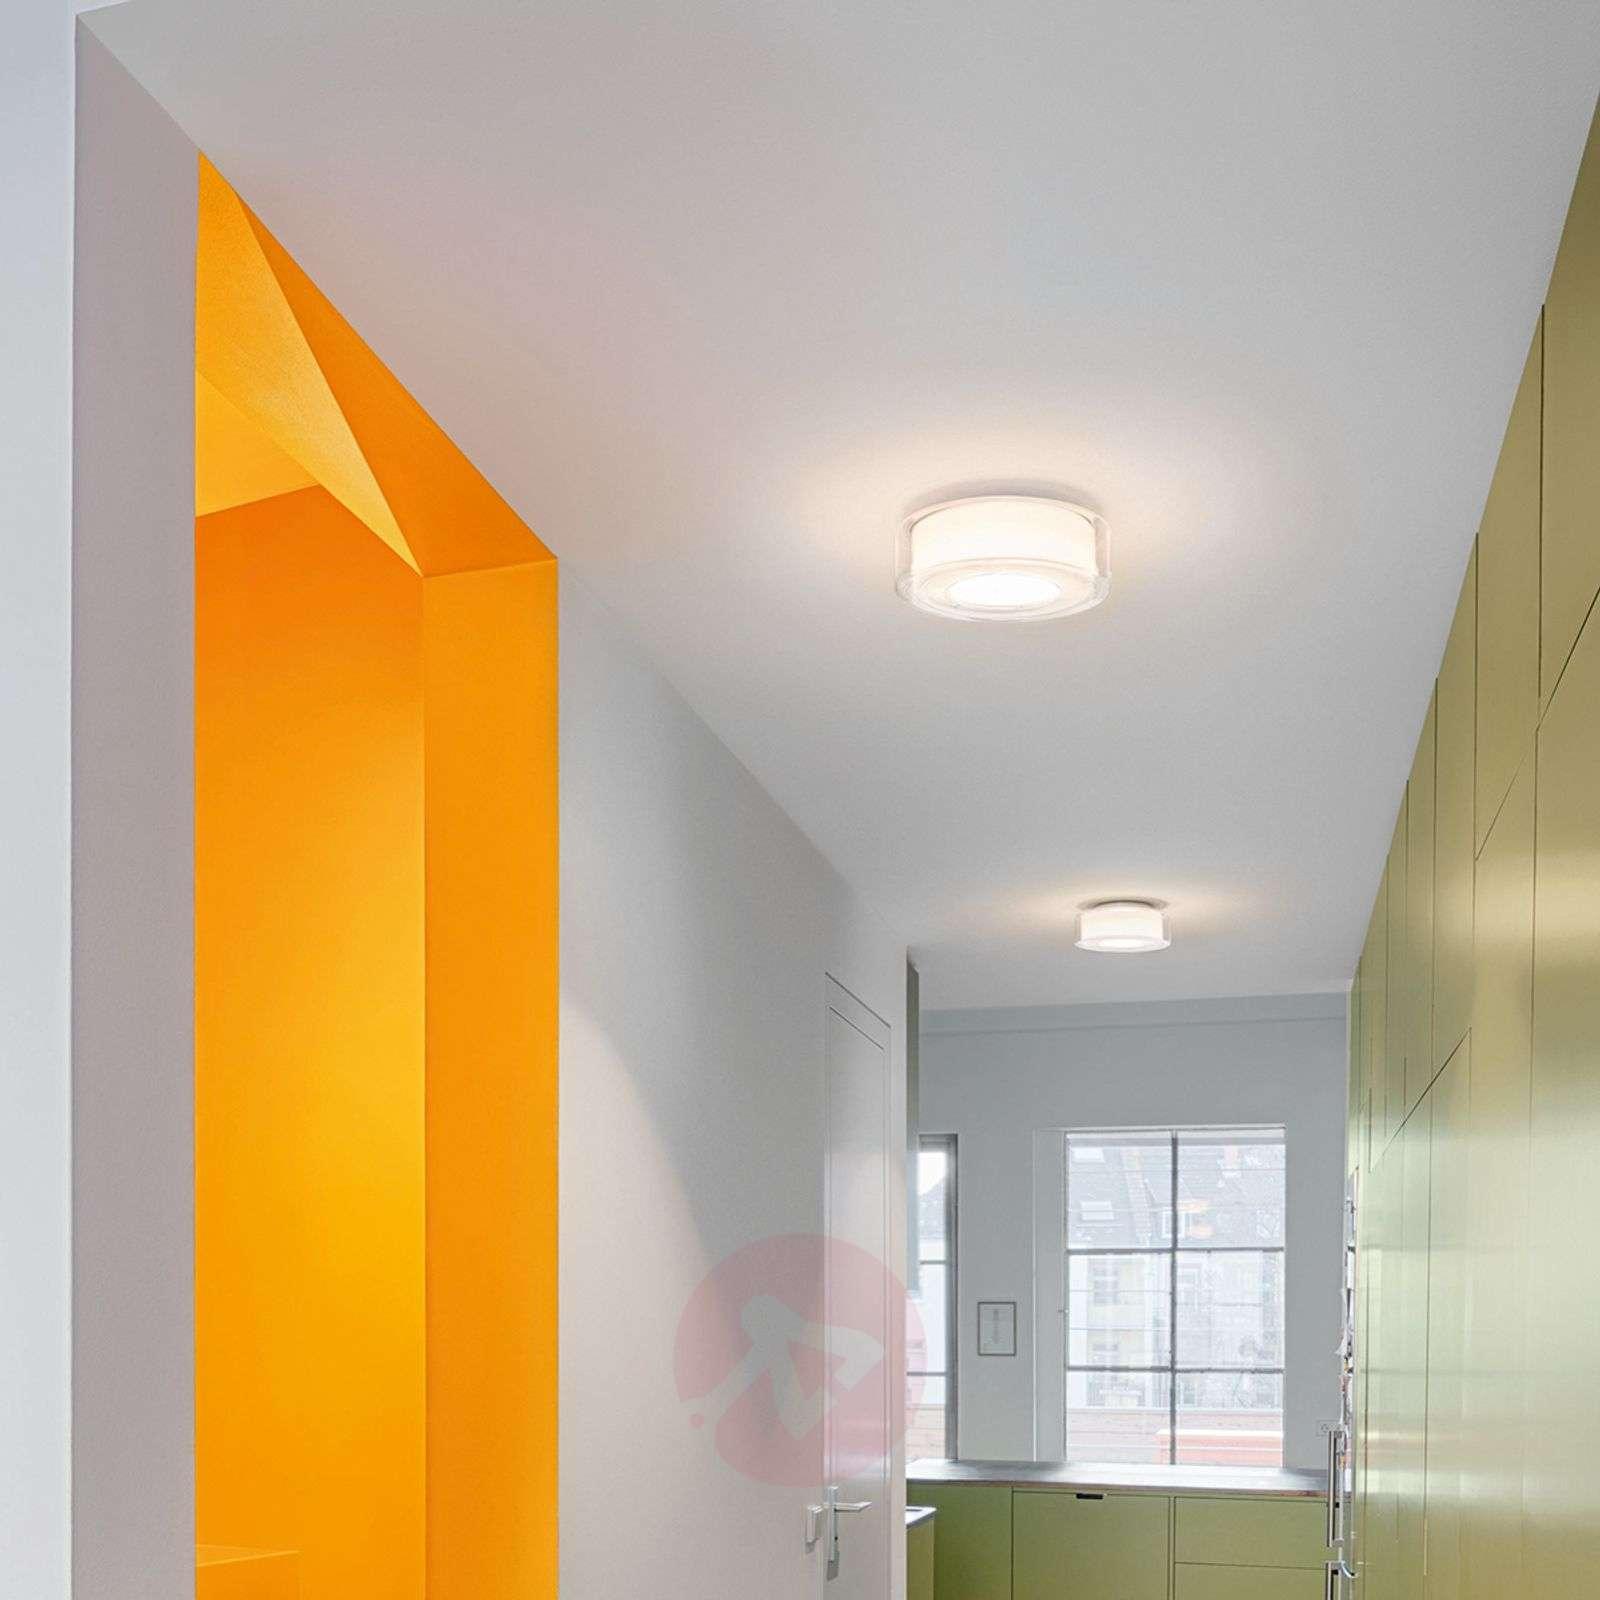 Glazed LED designer ceiling light Curling-8550016-01